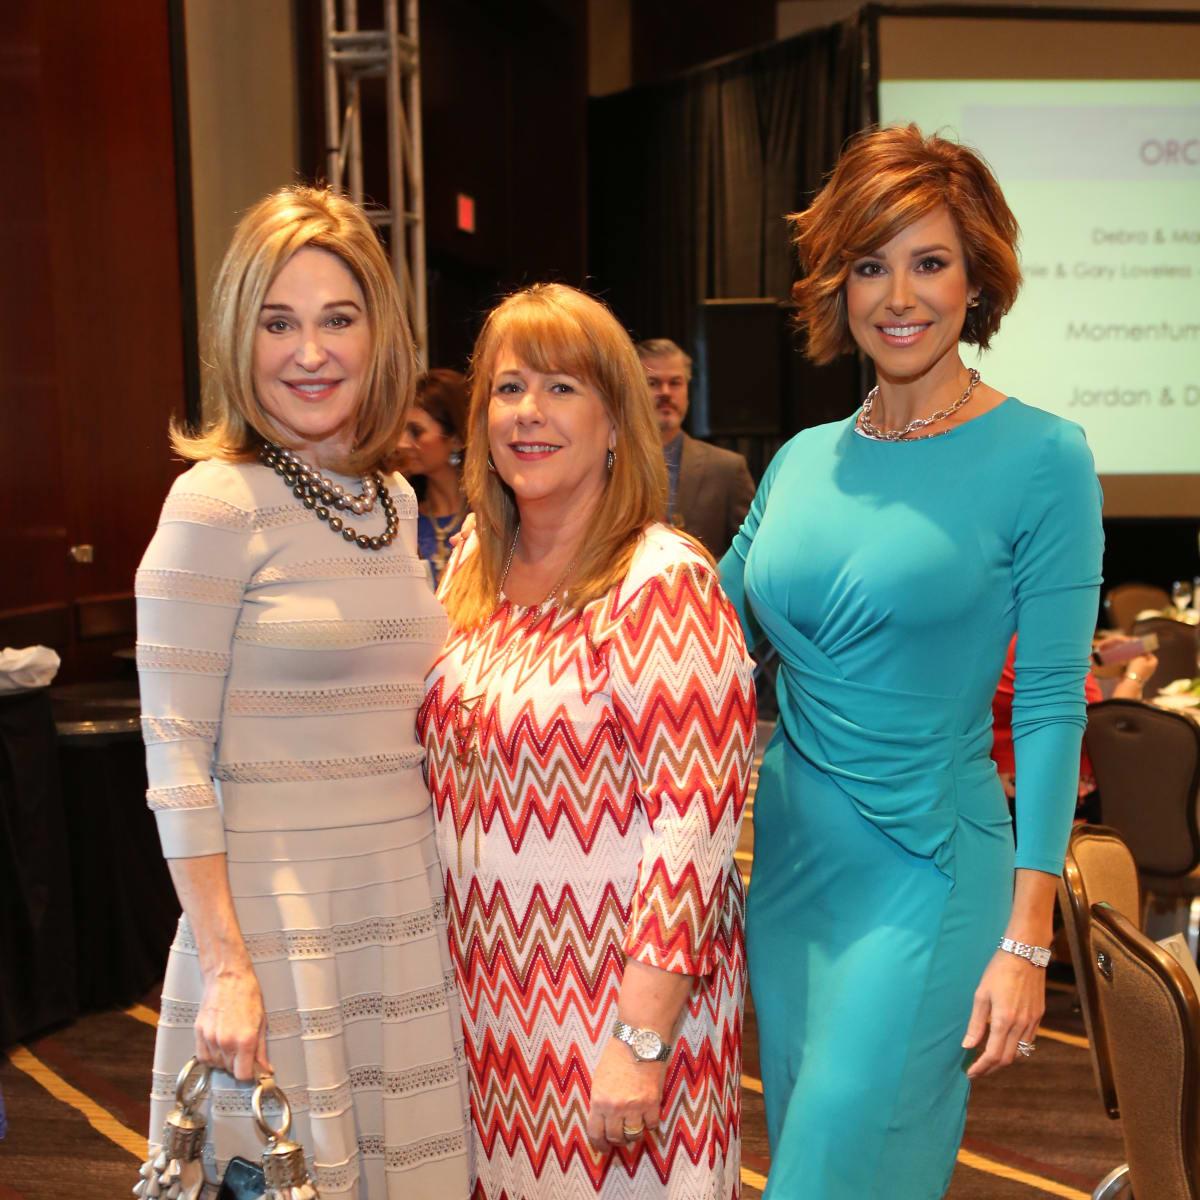 Children's Assessment Center, 4/16, Becca Cason Thrash, Stacey Swift, Dominique Sachse